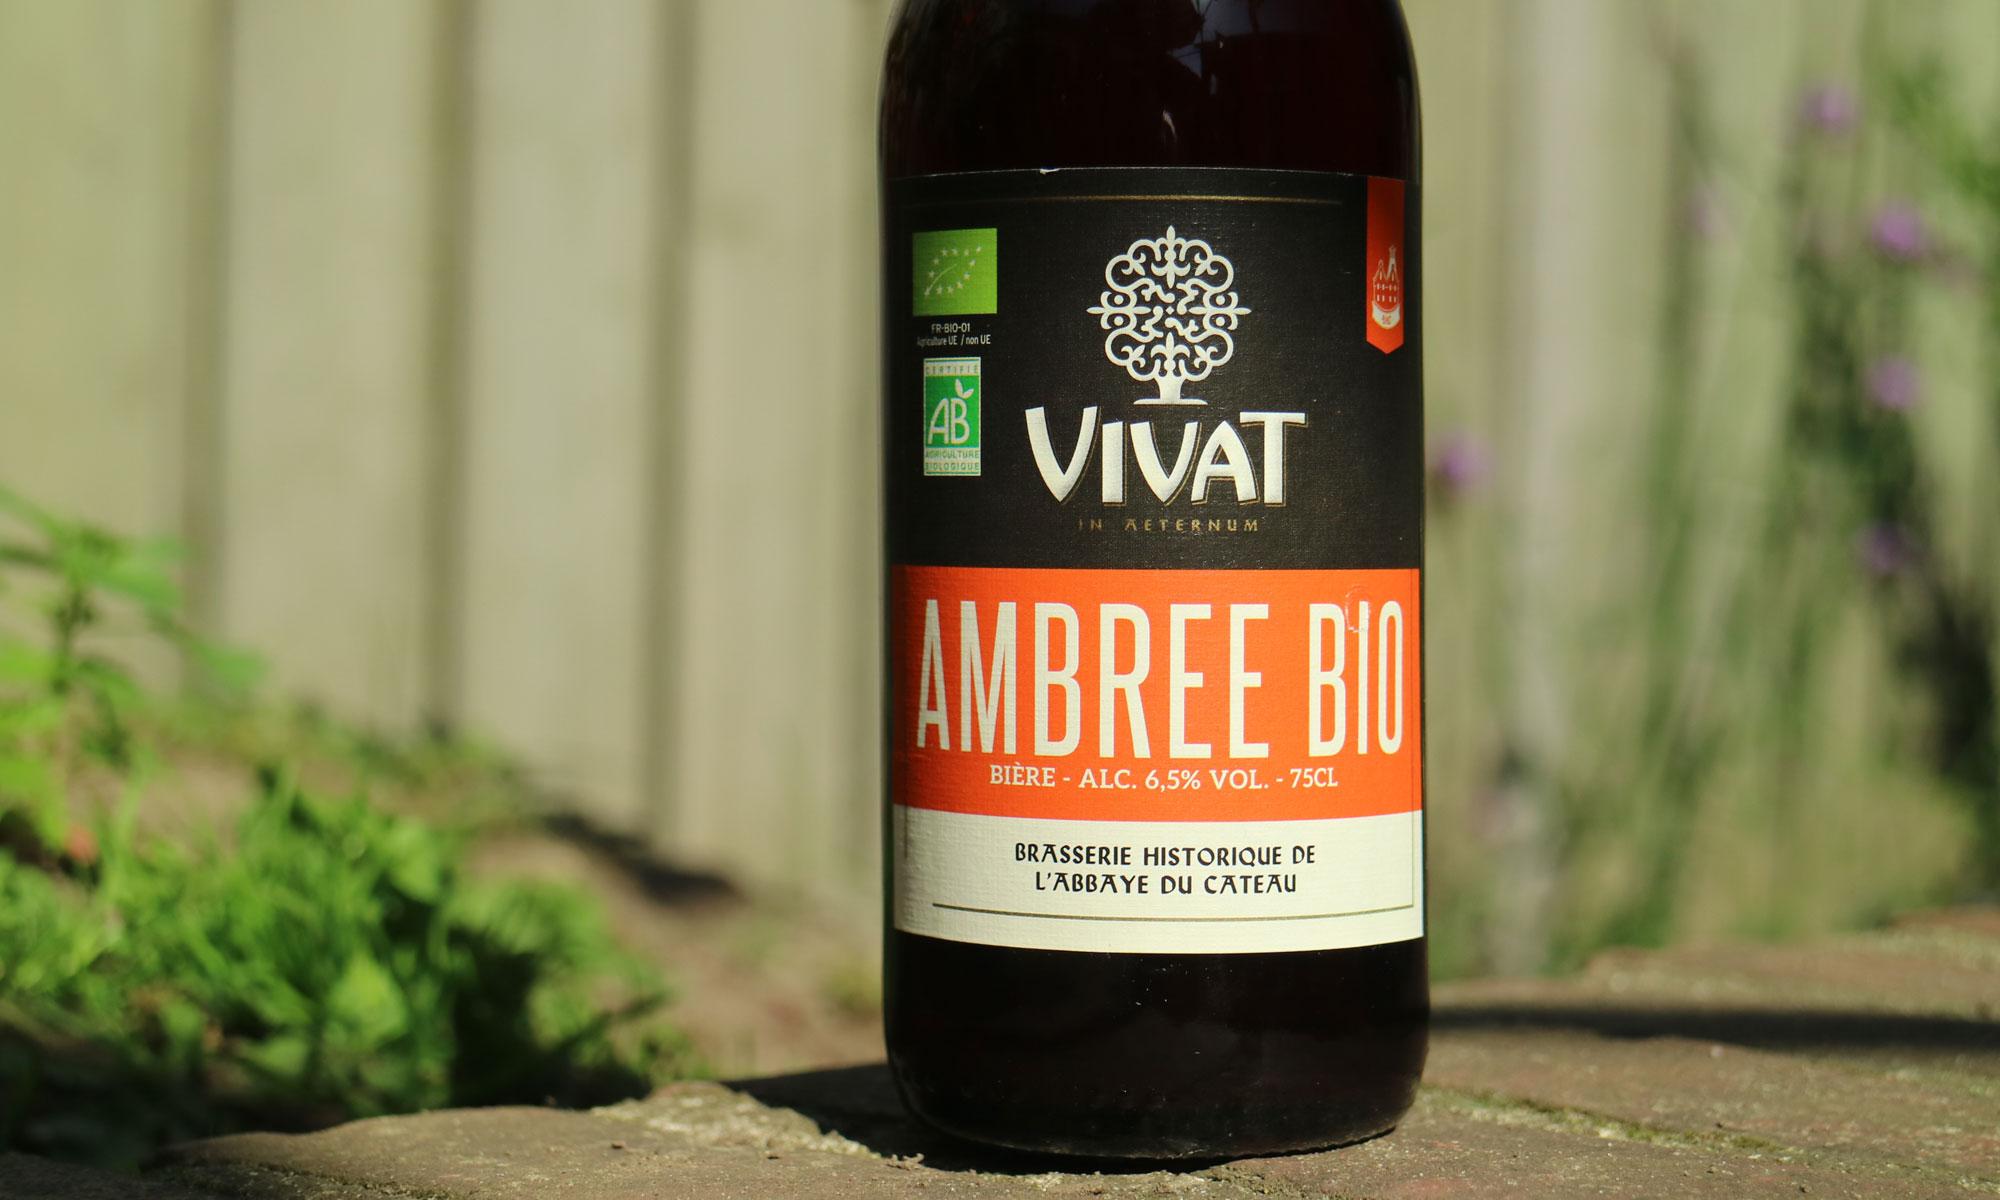 Vivat Ambree Bio